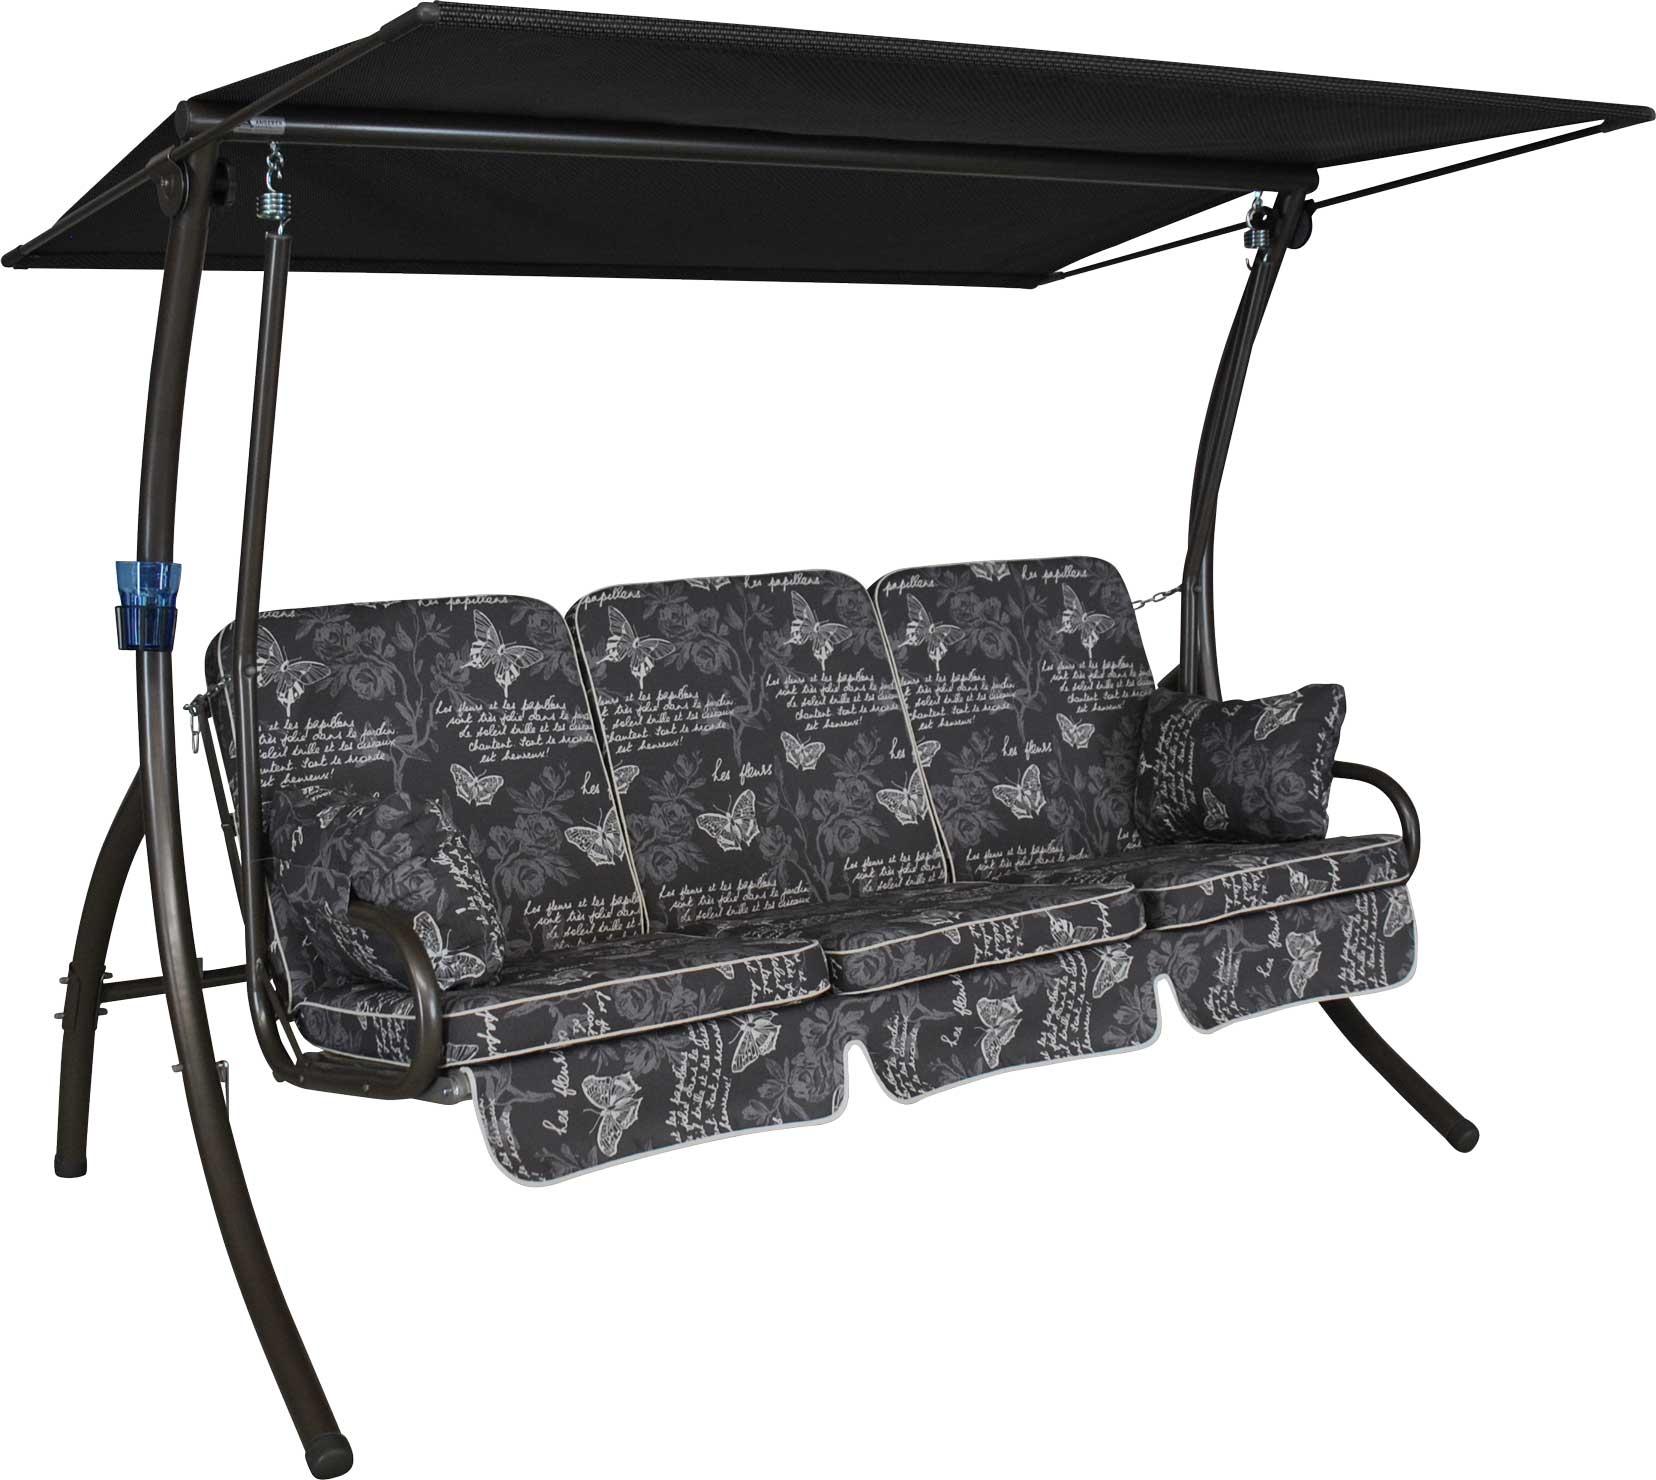 Angerer Hollywoodschaukel Primero Schmetterling - 3-Sitzer